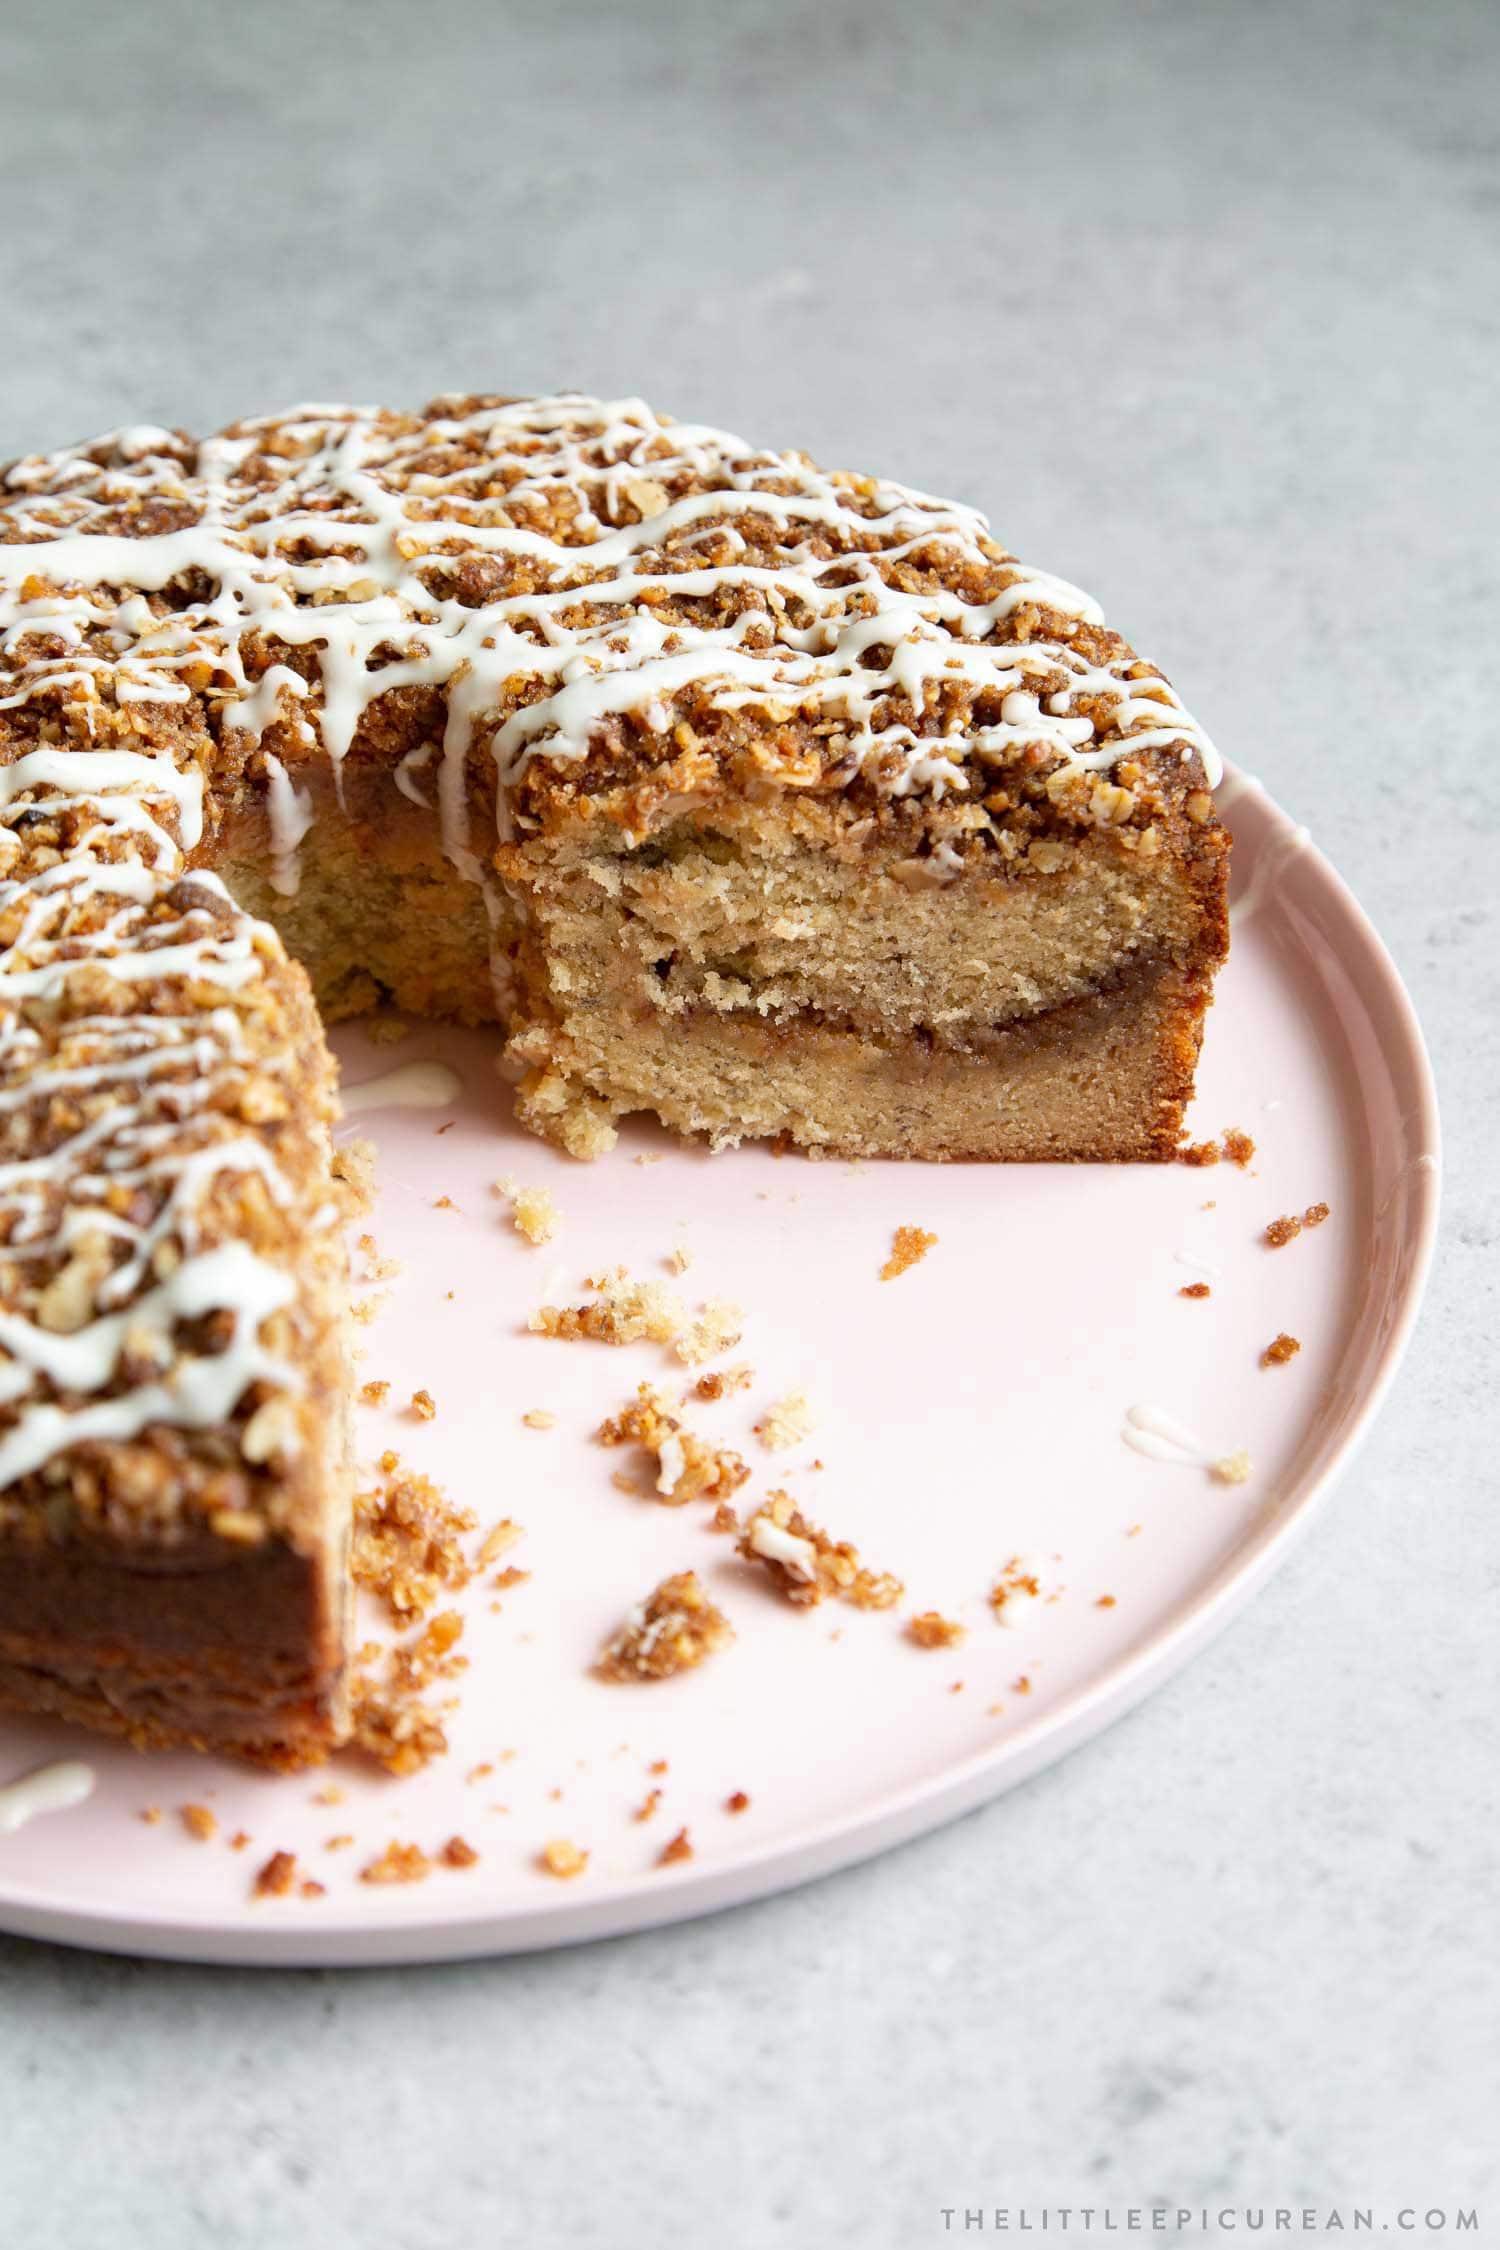 Banana Crumb Cake. Moist banana cake with cinnamon sugar filling topped with walnut oat crumble topping. Banana Crumb Cake. Moist banana cake with cinnamon sugar filling topped with walnut oat crumble topping. Finished with maple glaze icing.